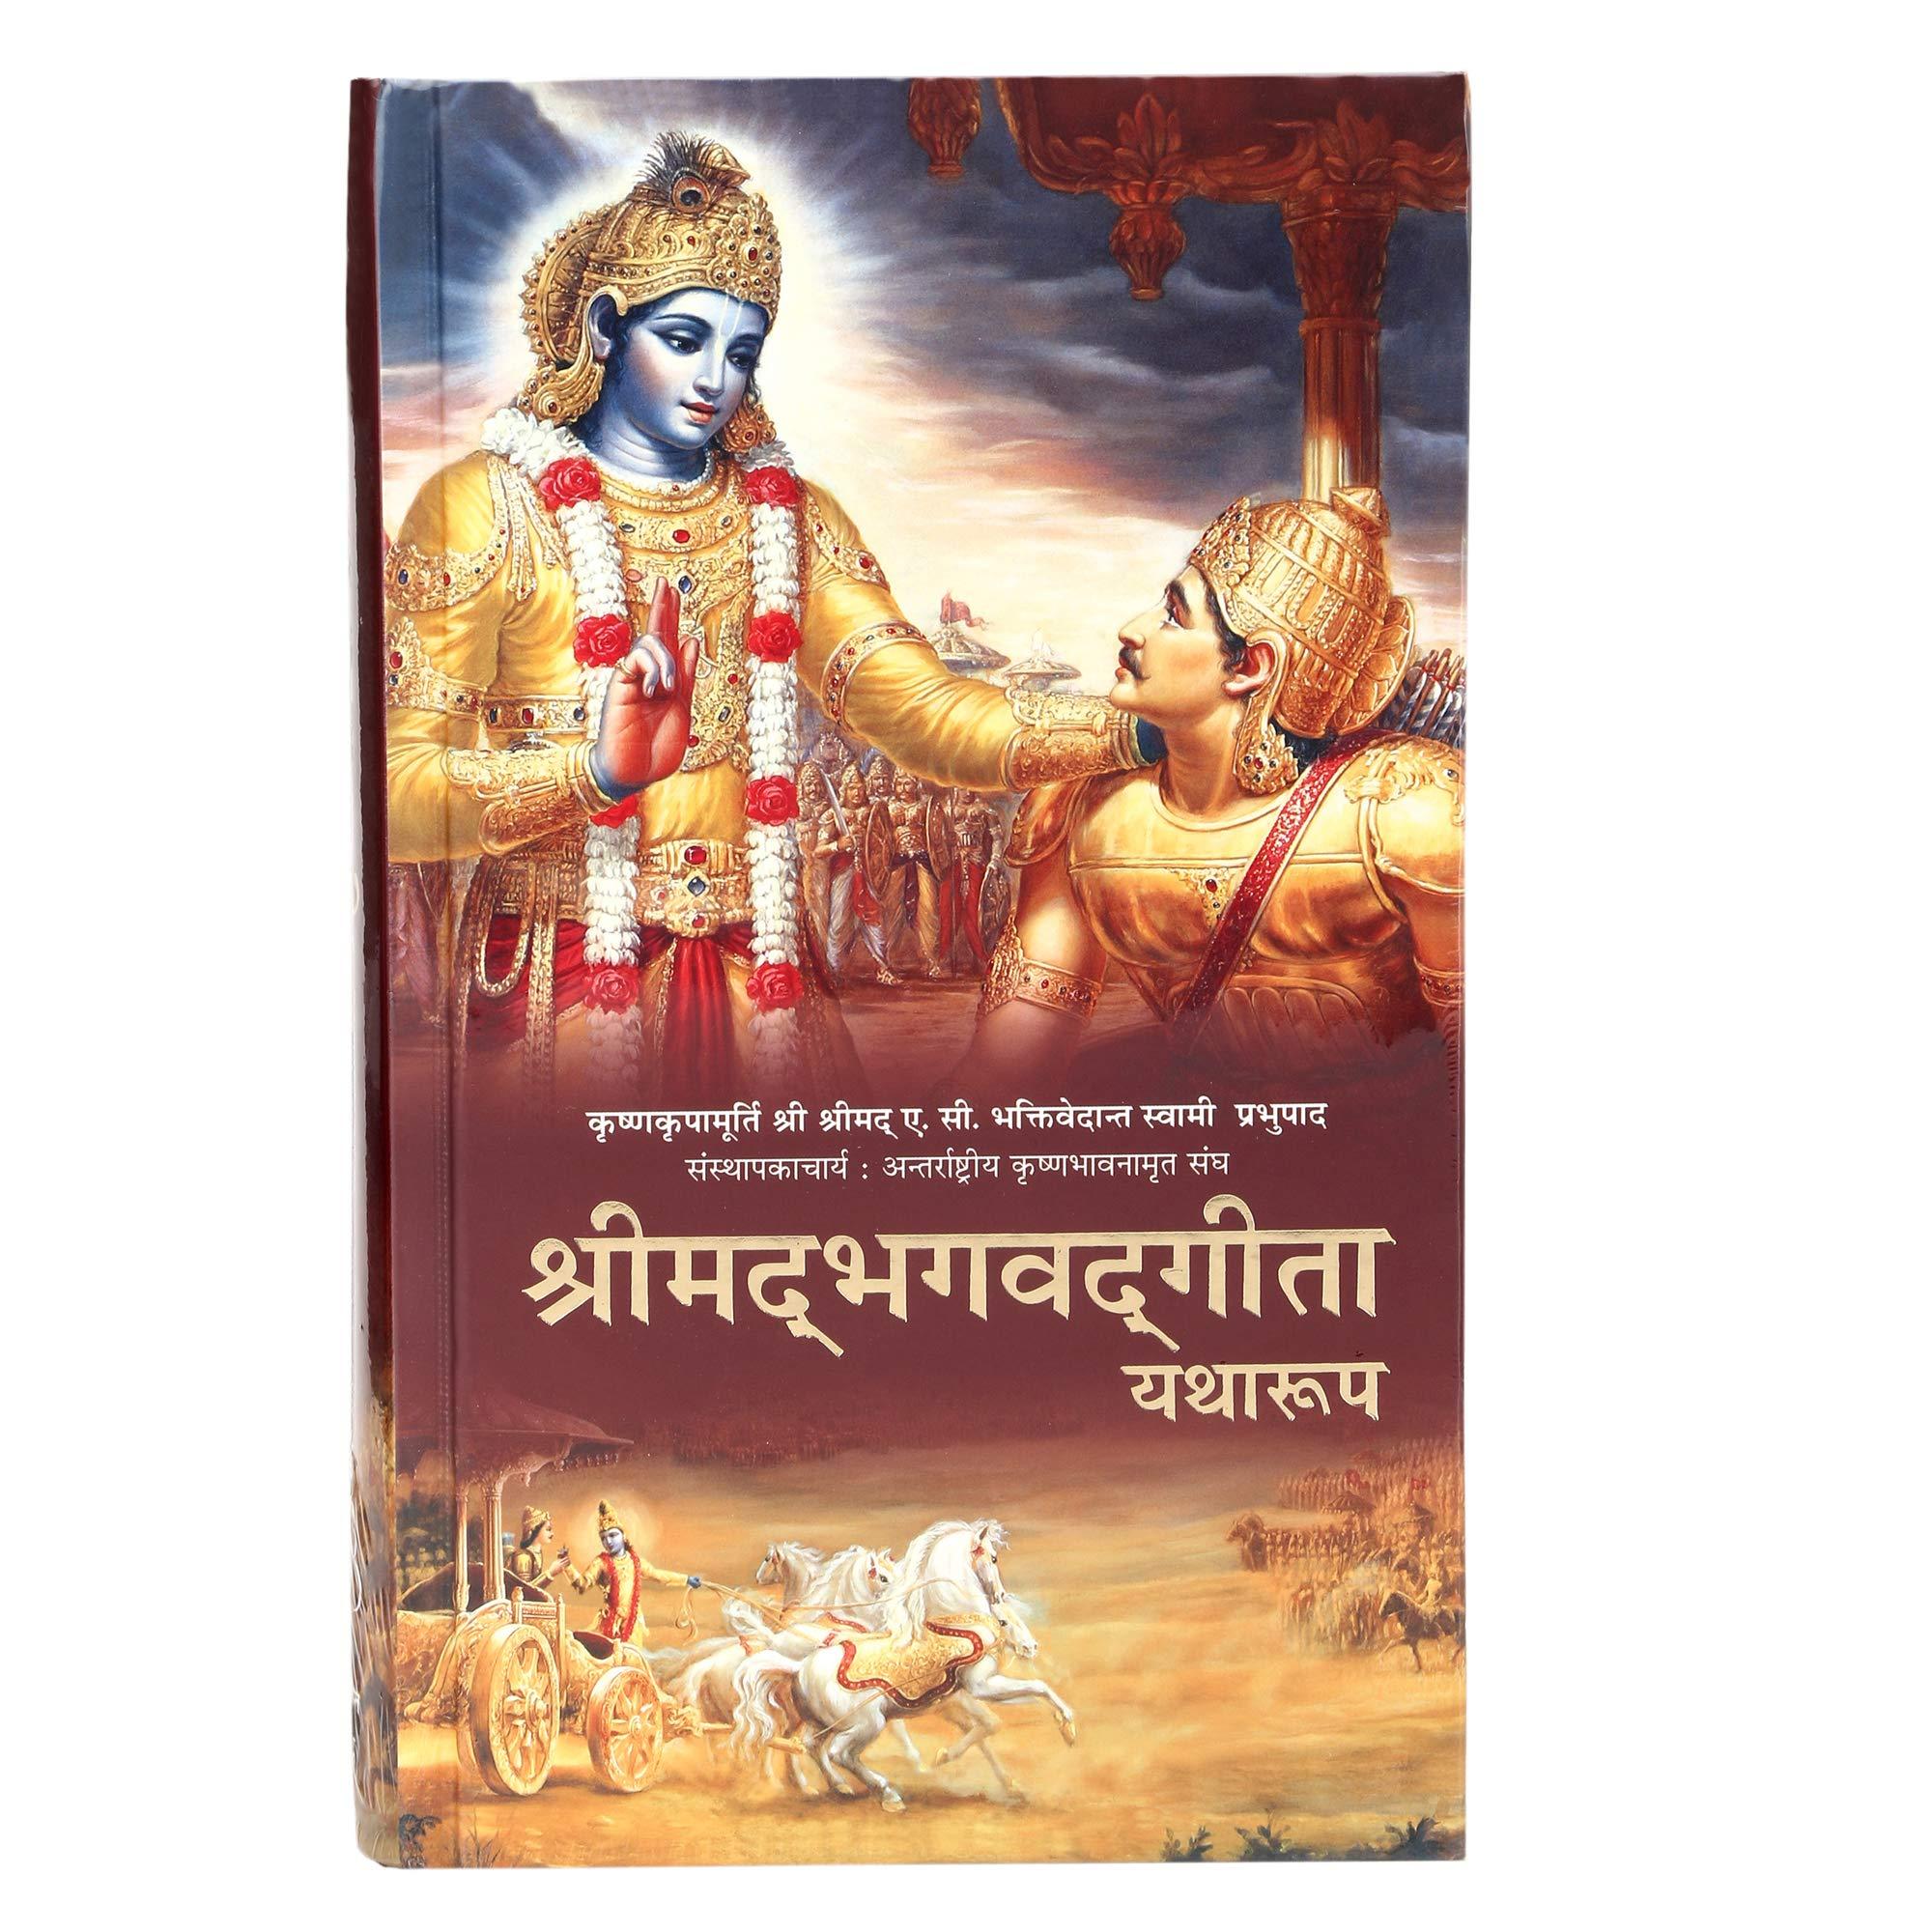 Buy Bhagavad Gita: Yatharoop Book Online at Low Prices in India